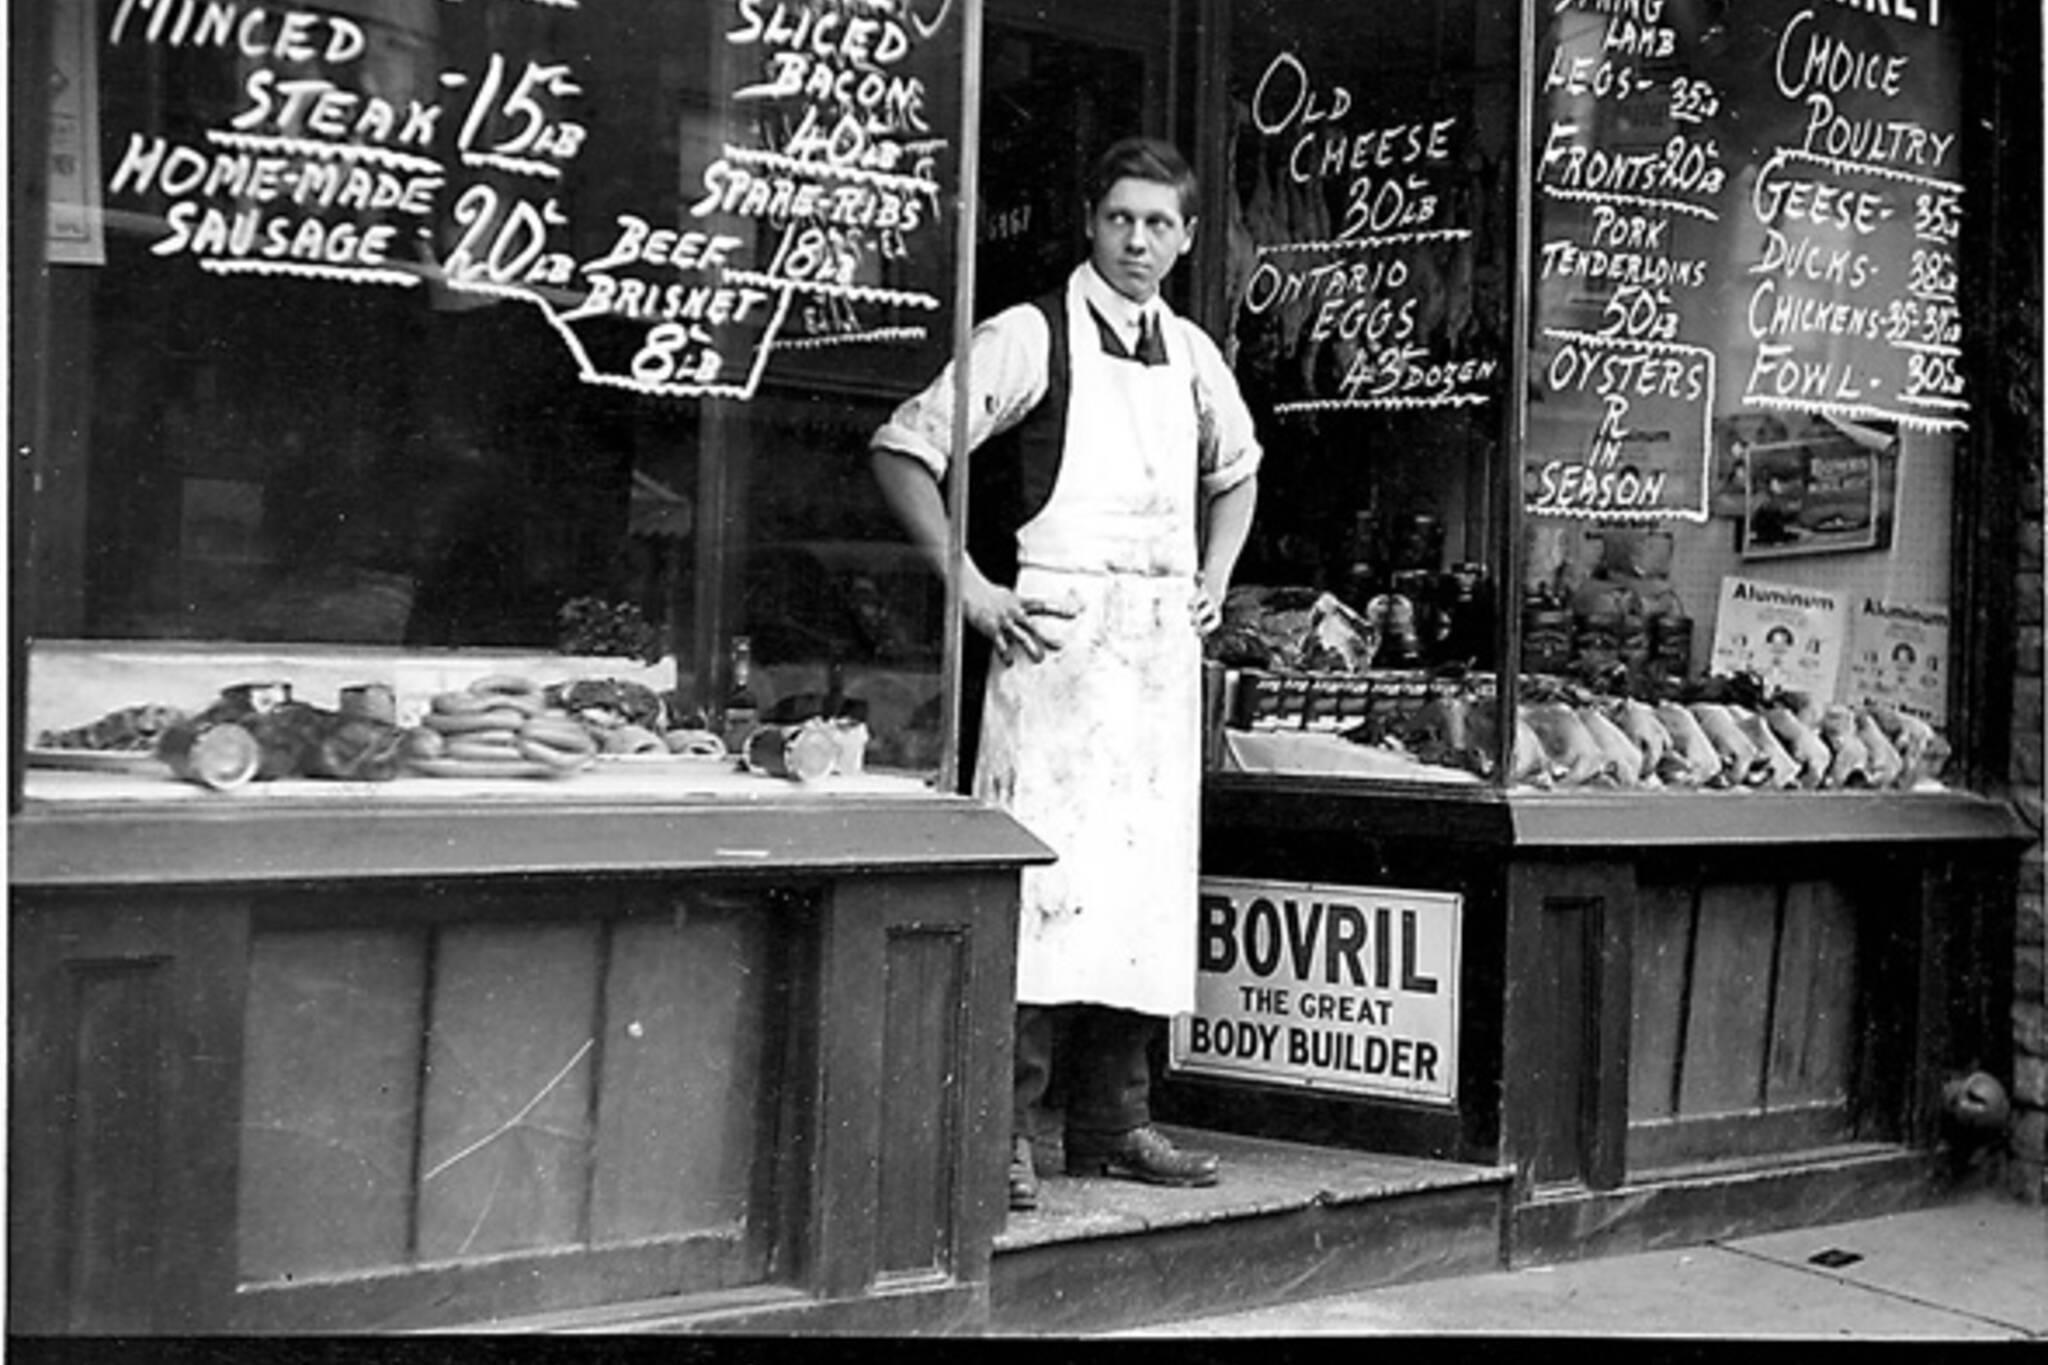 History Butcher Shops Toronto